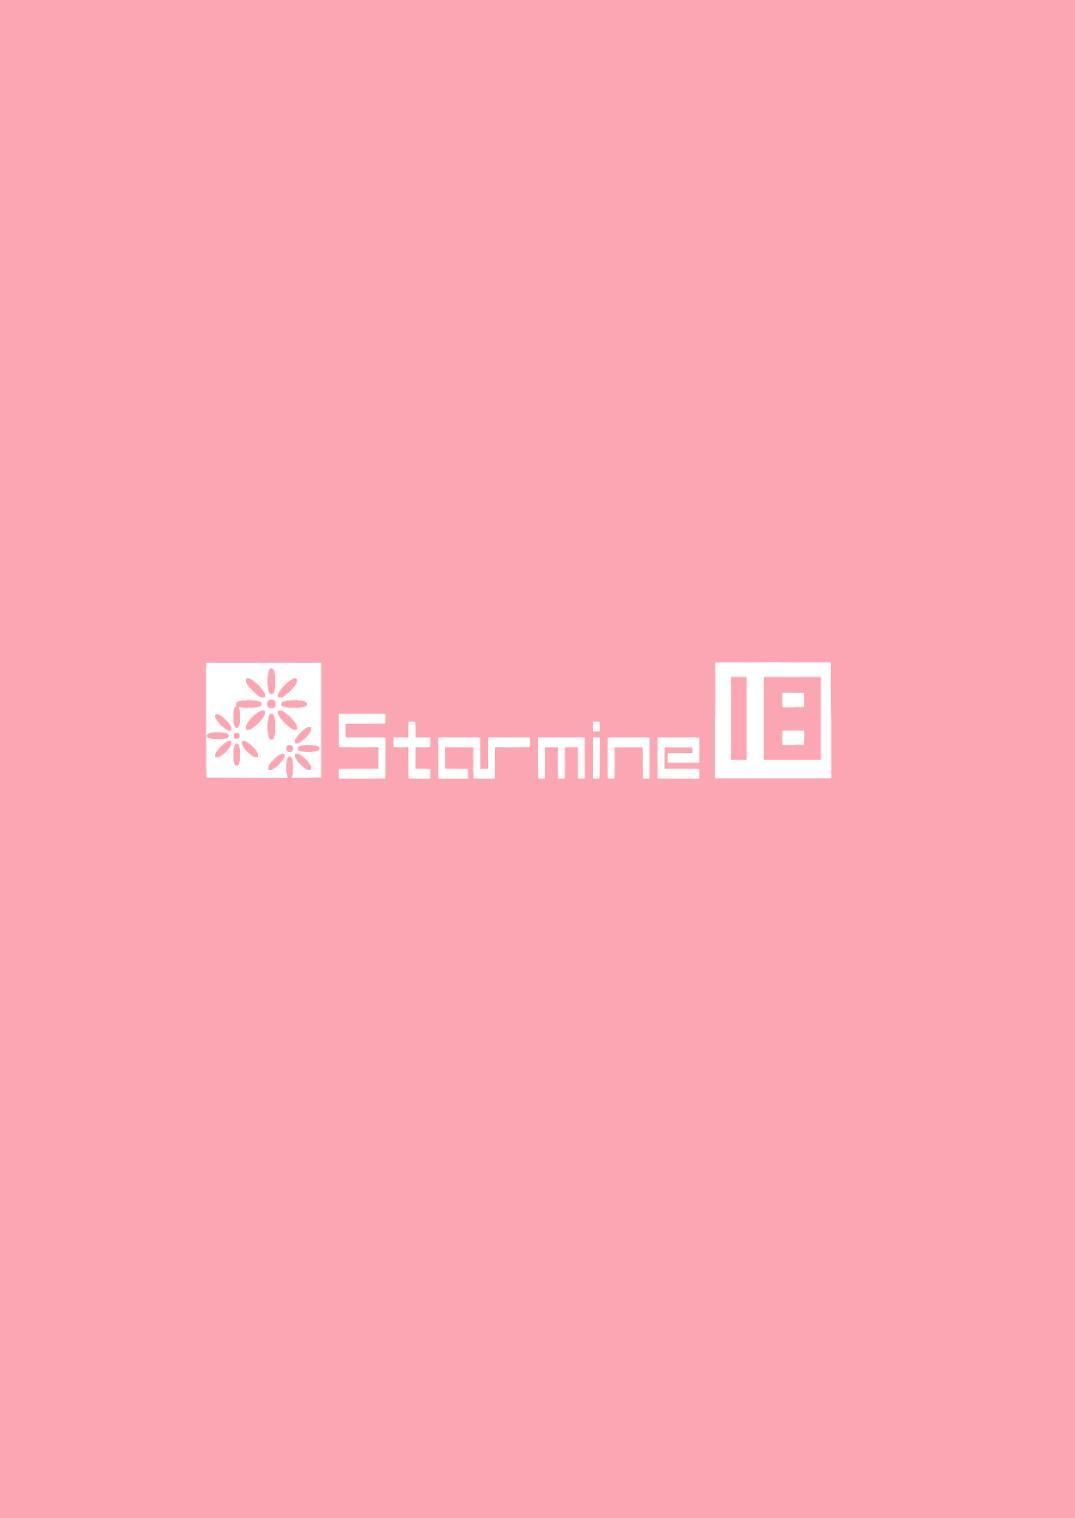 [Starmine18 (HANABi)] Kanrinin-san to Onahole | Caretaker-san and the onahole (Sunohara-sou no Kanrinin-san) [English] [Tabunne Scans] [Digital] 18